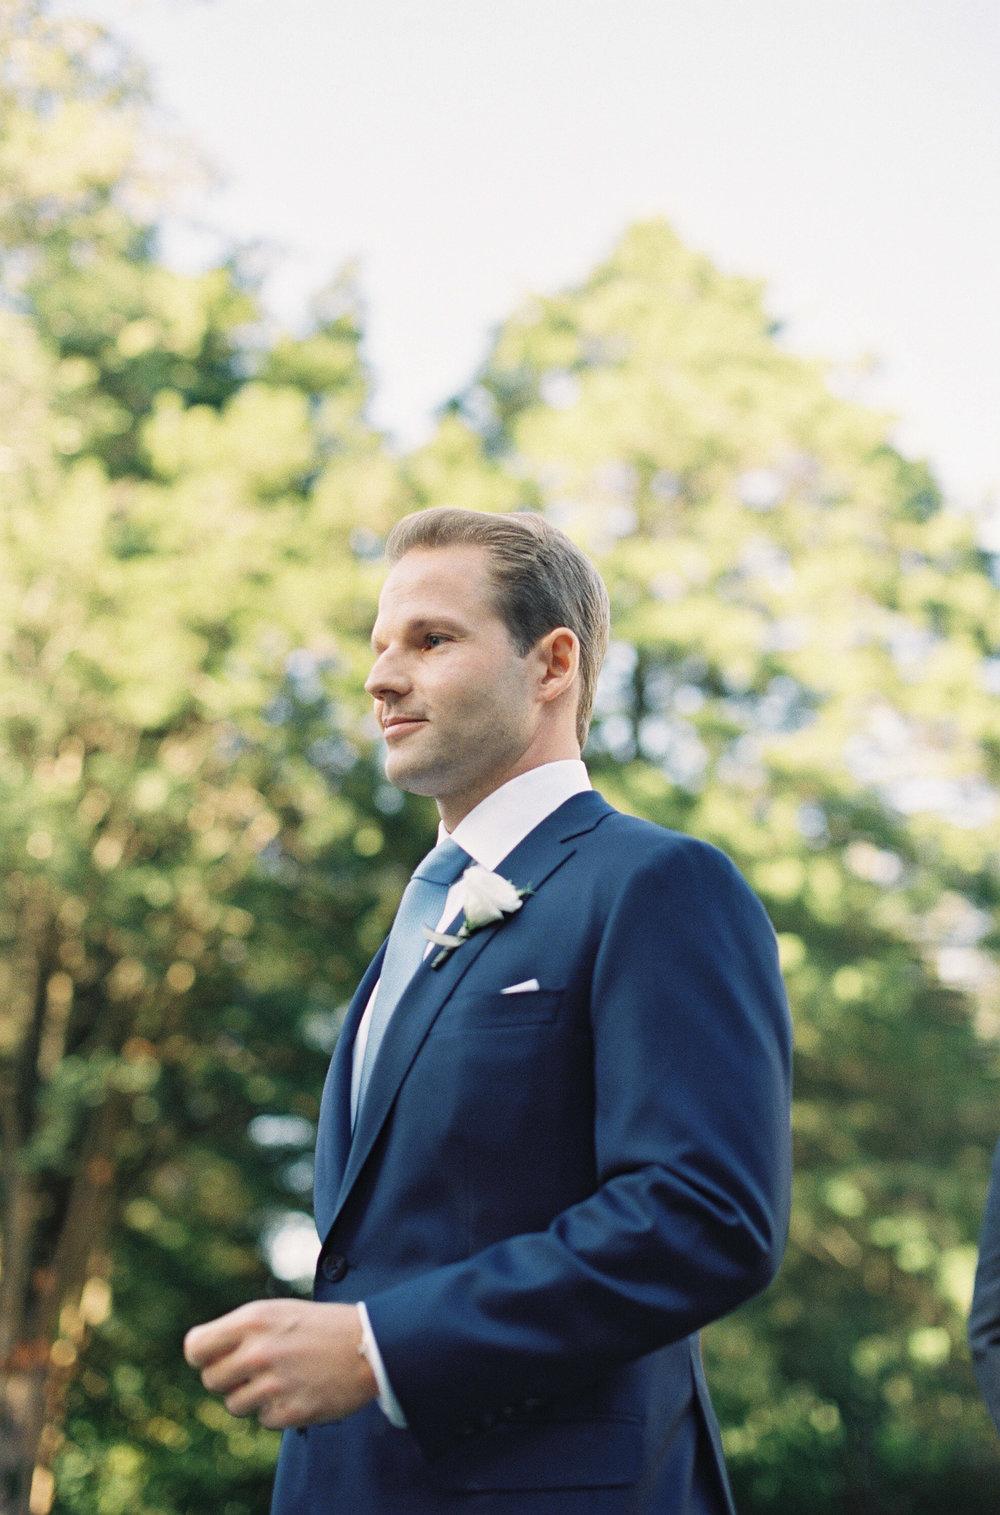 Connecticut-Wedding-33-Jen-Huang-20170909-KB-206-Jen_Huang-006798-R1-008.jpg